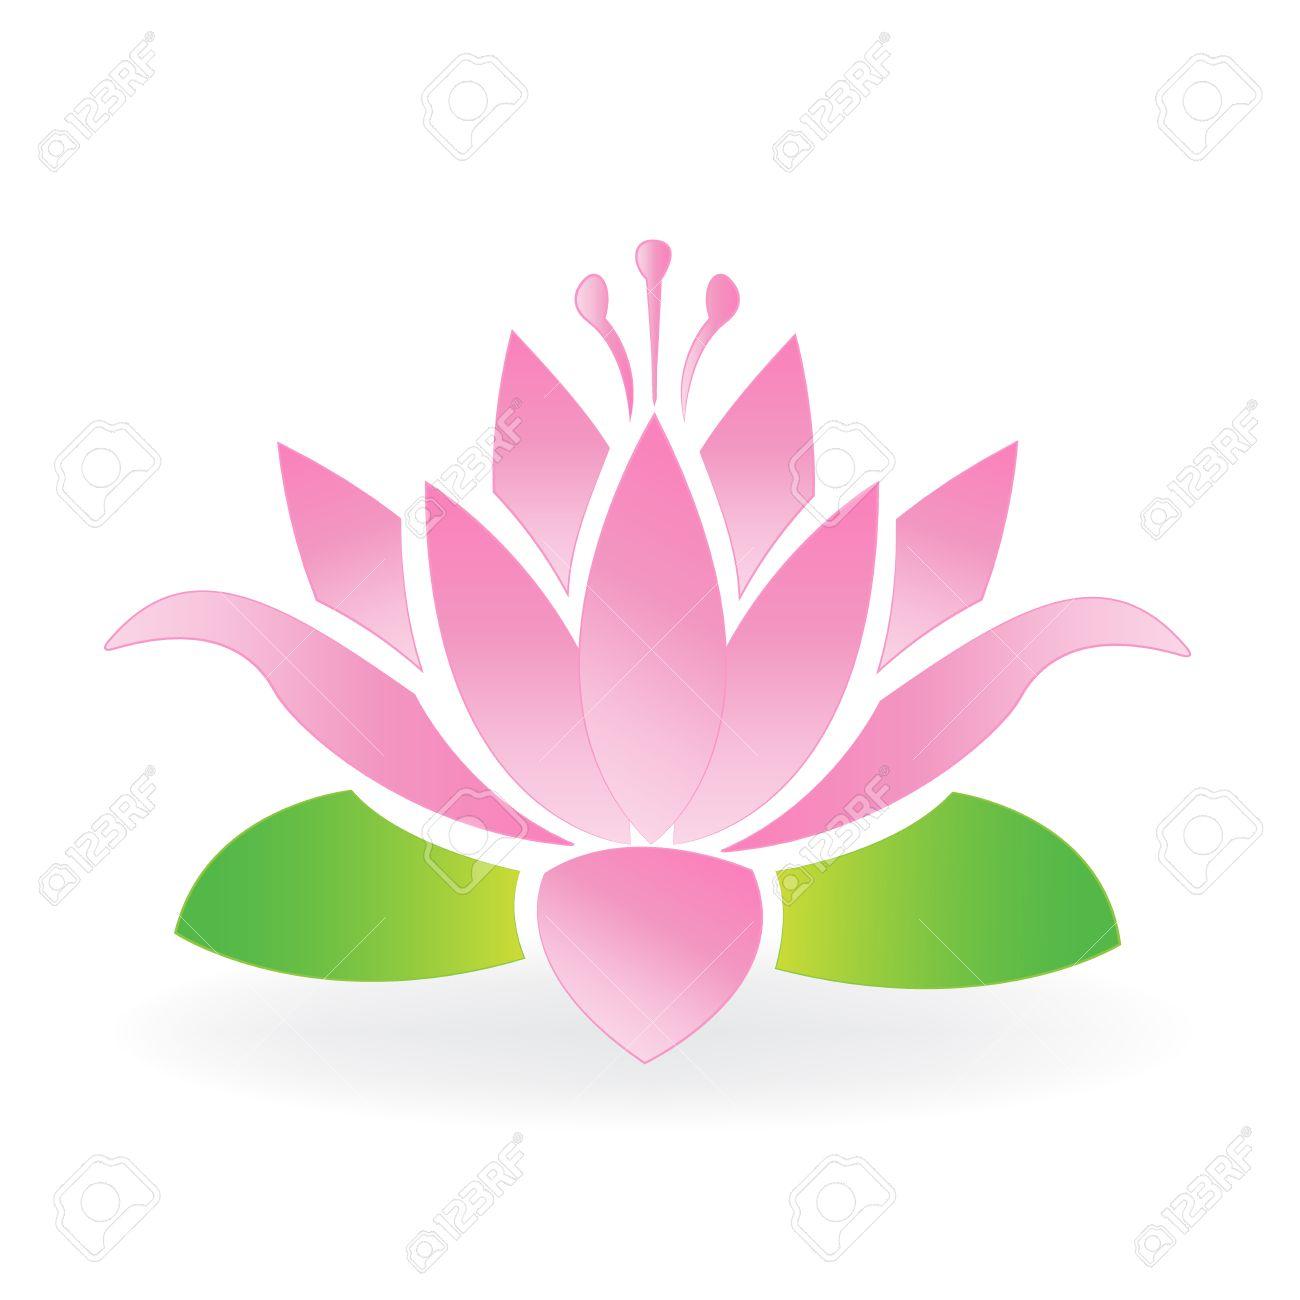 Цветы для логотипа фото